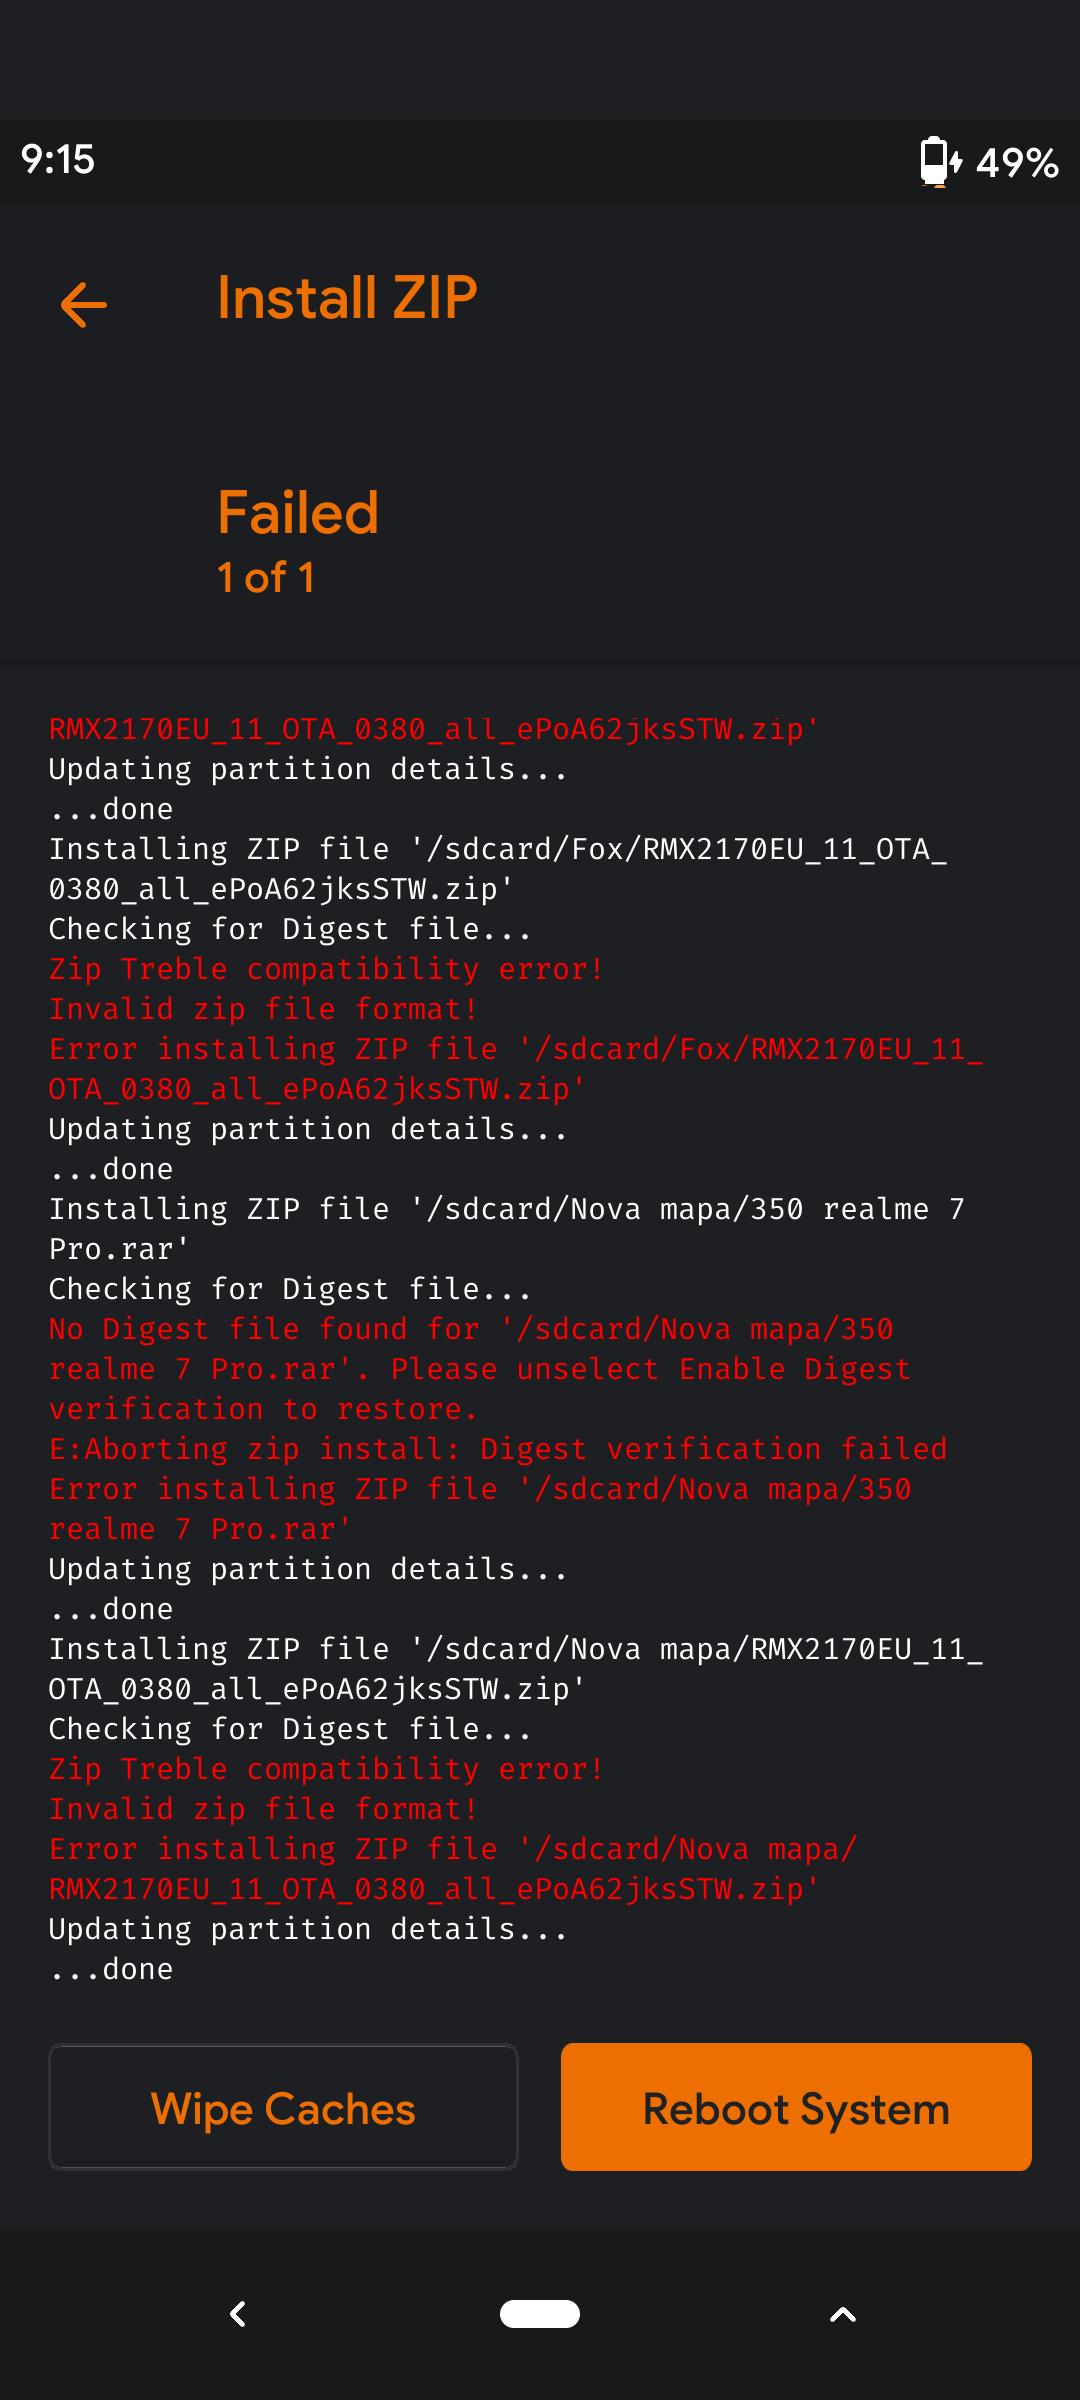 Screenshot_2021-09-11-09-15-55.png